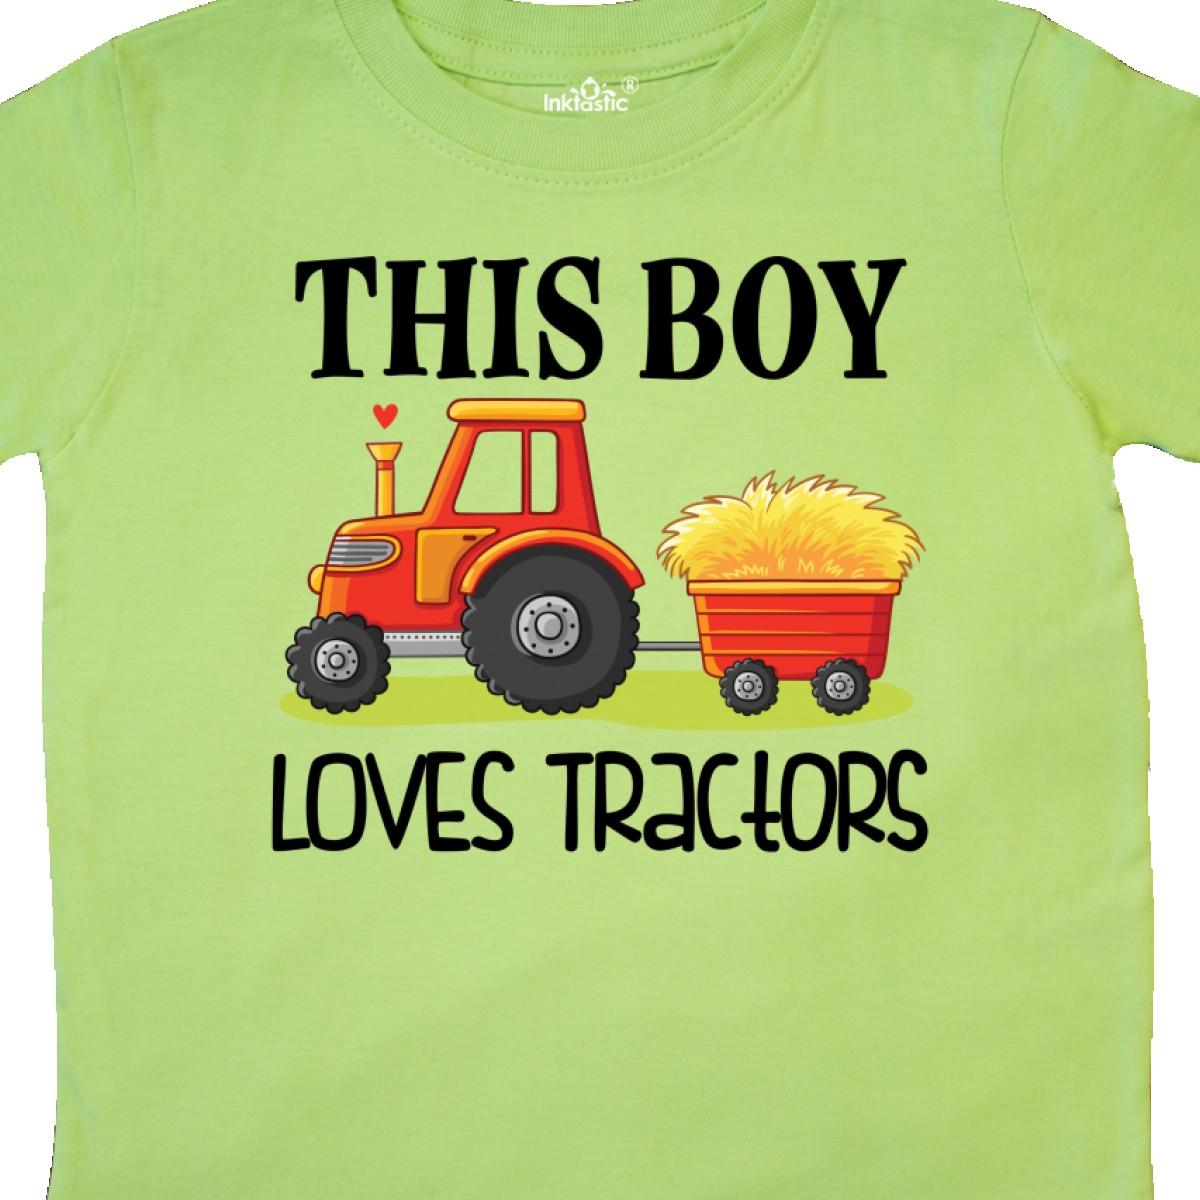 Inktastic-Farming-Cute-Boy-Loves-Tractors-Toddler-T-Shirt-Farm-Childs-Toys-Kids thumbnail 12